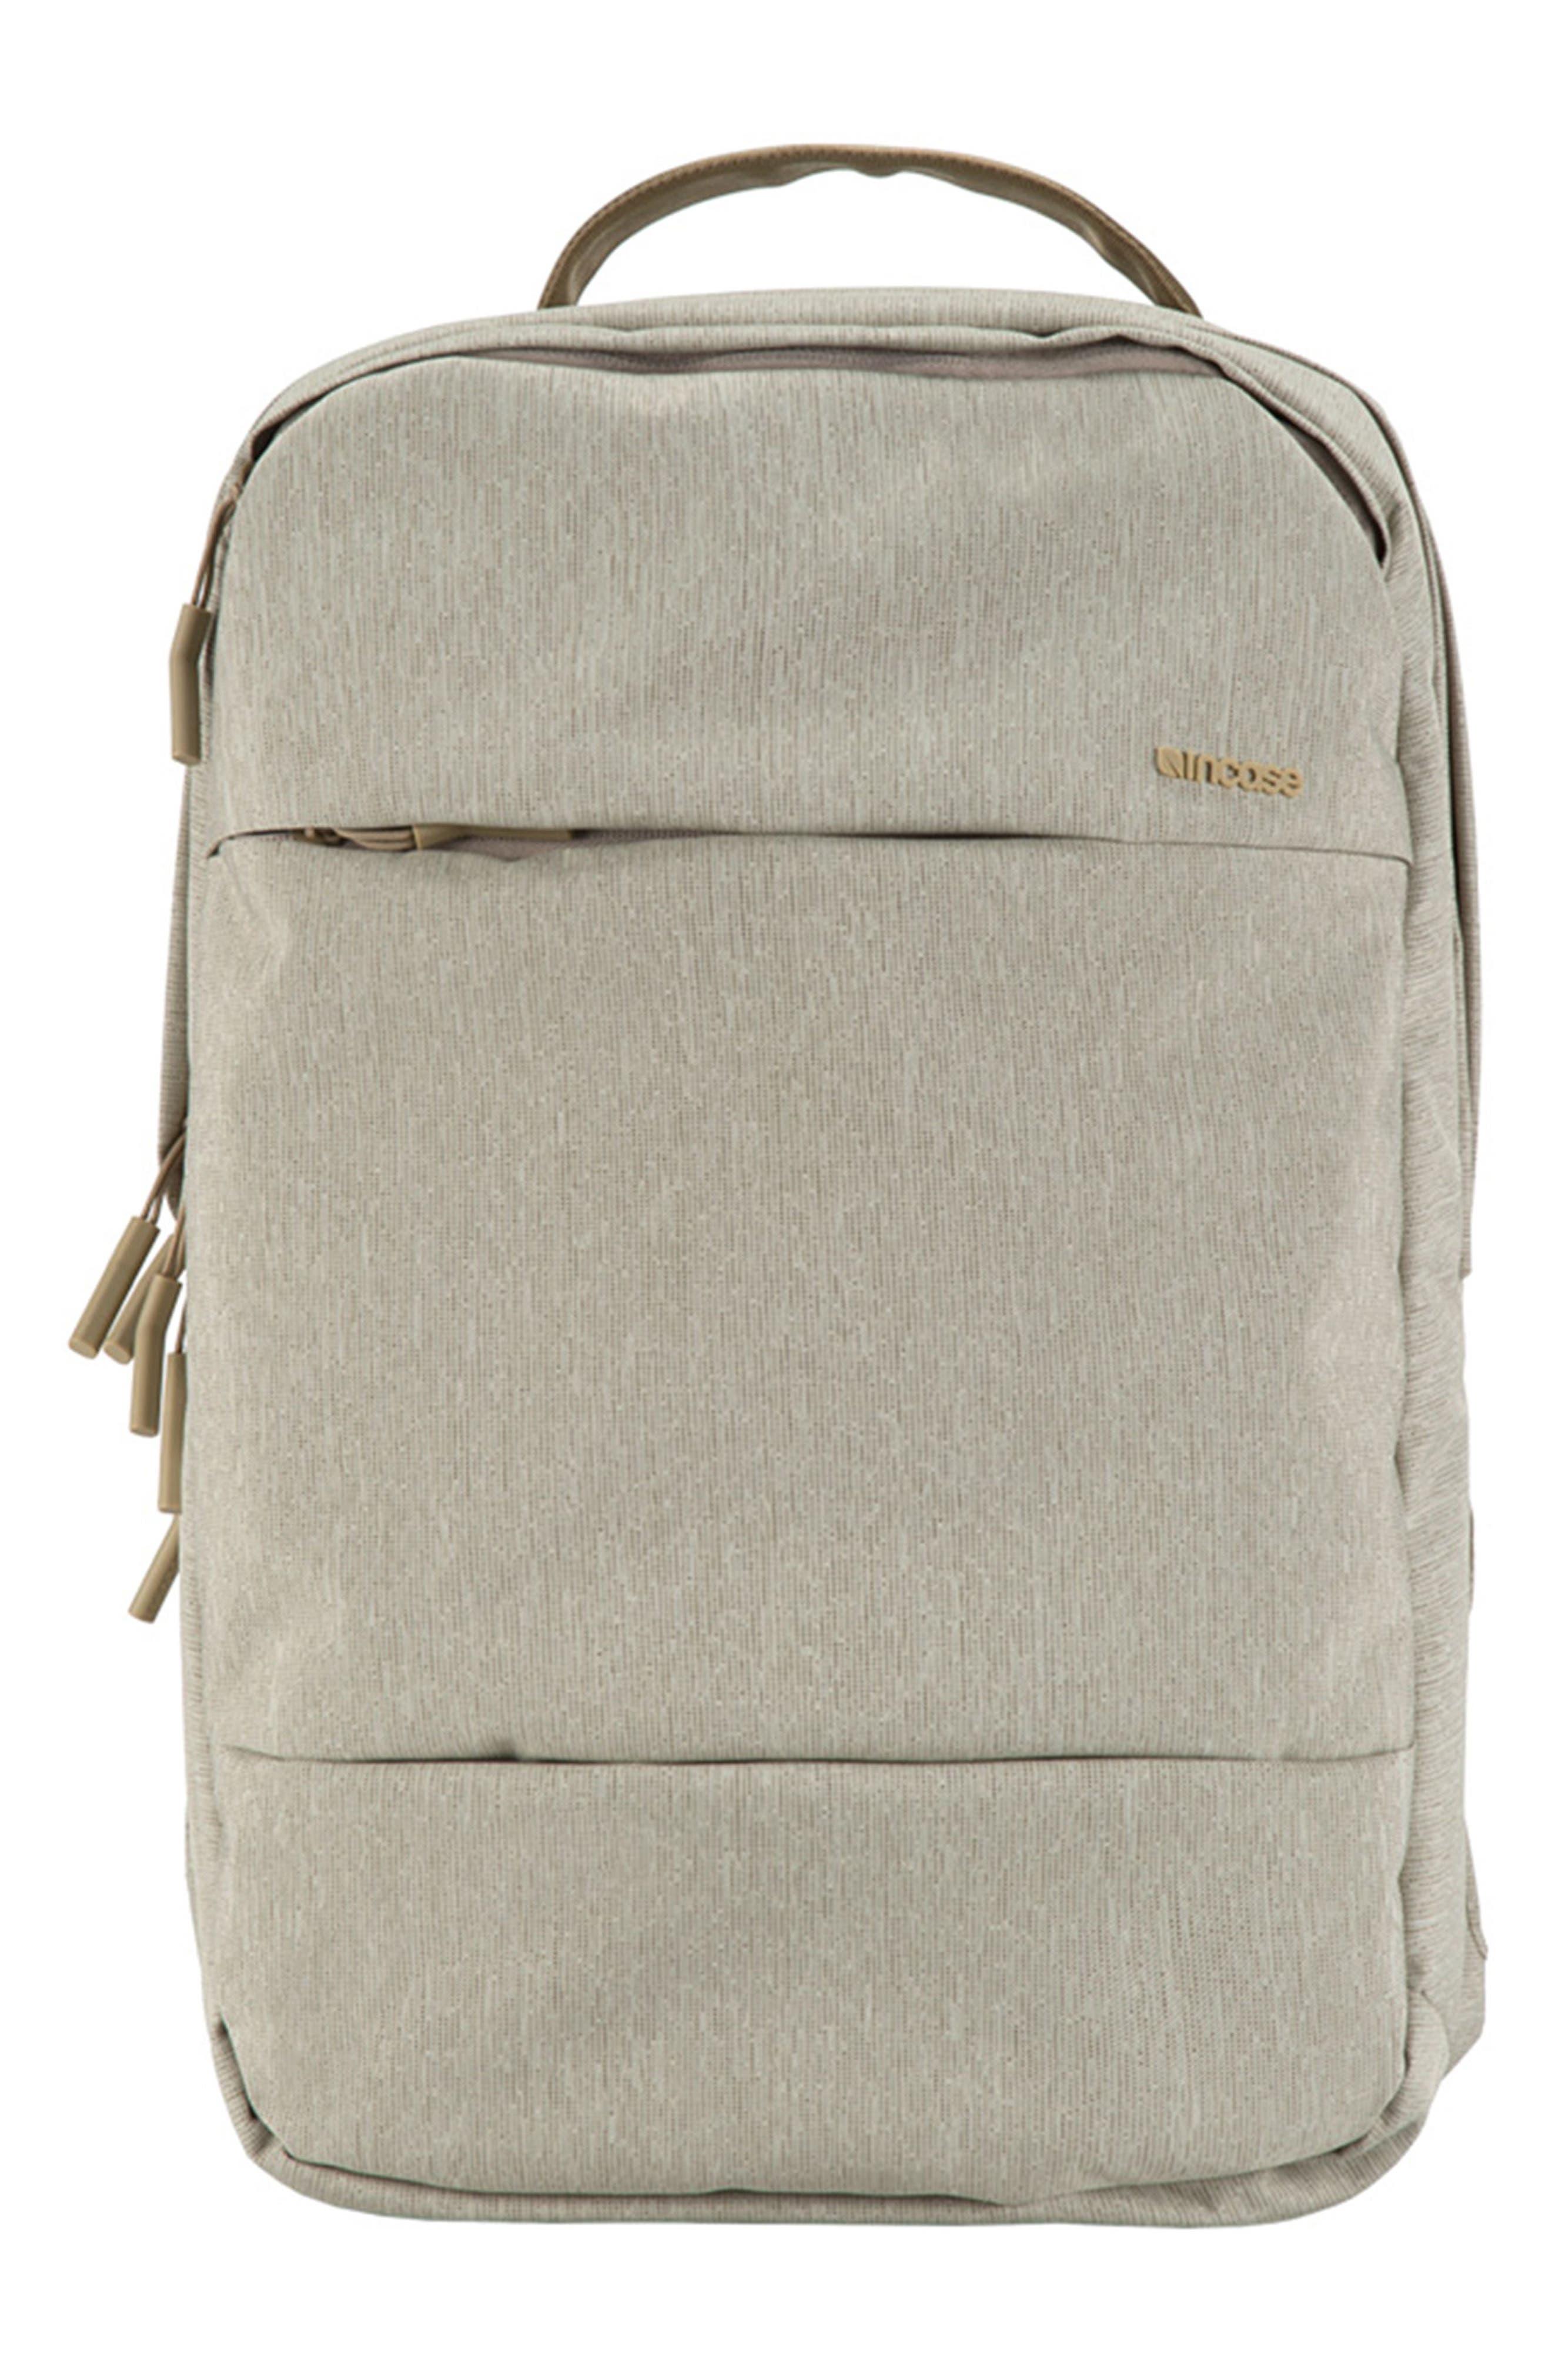 City Backpack,                         Main,                         color, Heather Khaki